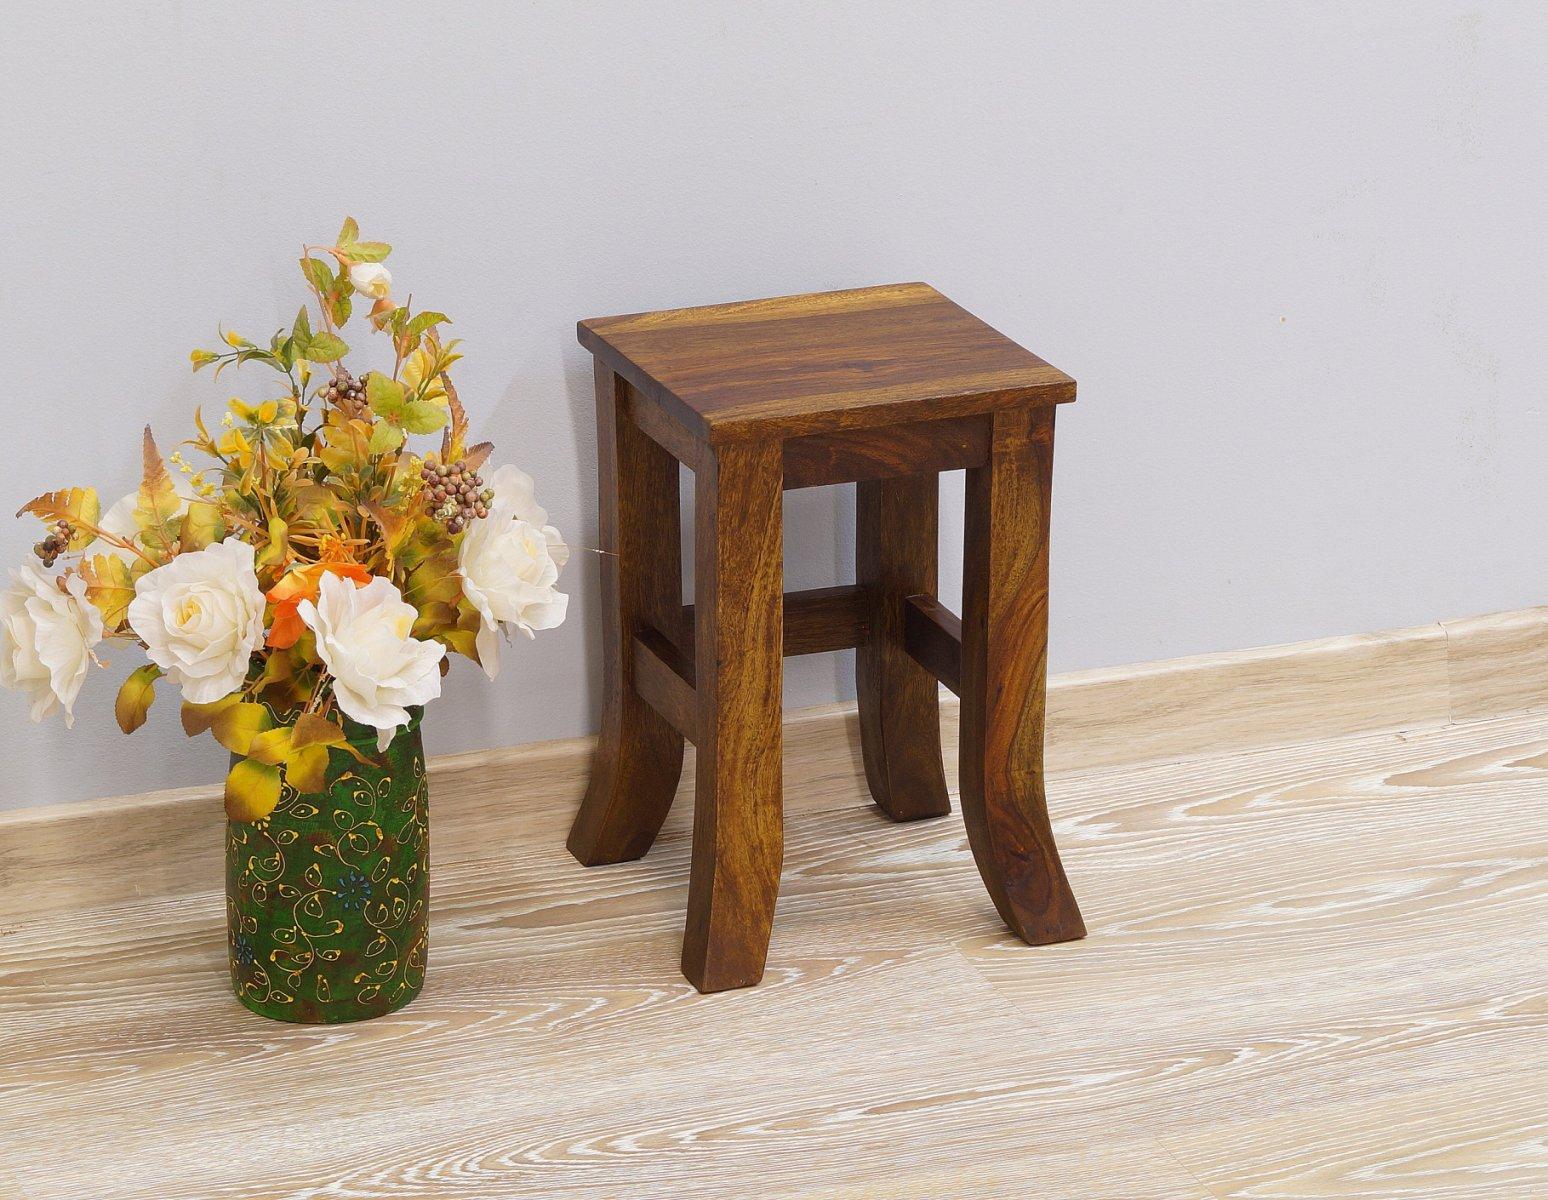 Taboret kolonialny stolik stołek lite drewno palisander indyjski niski gięte nogi